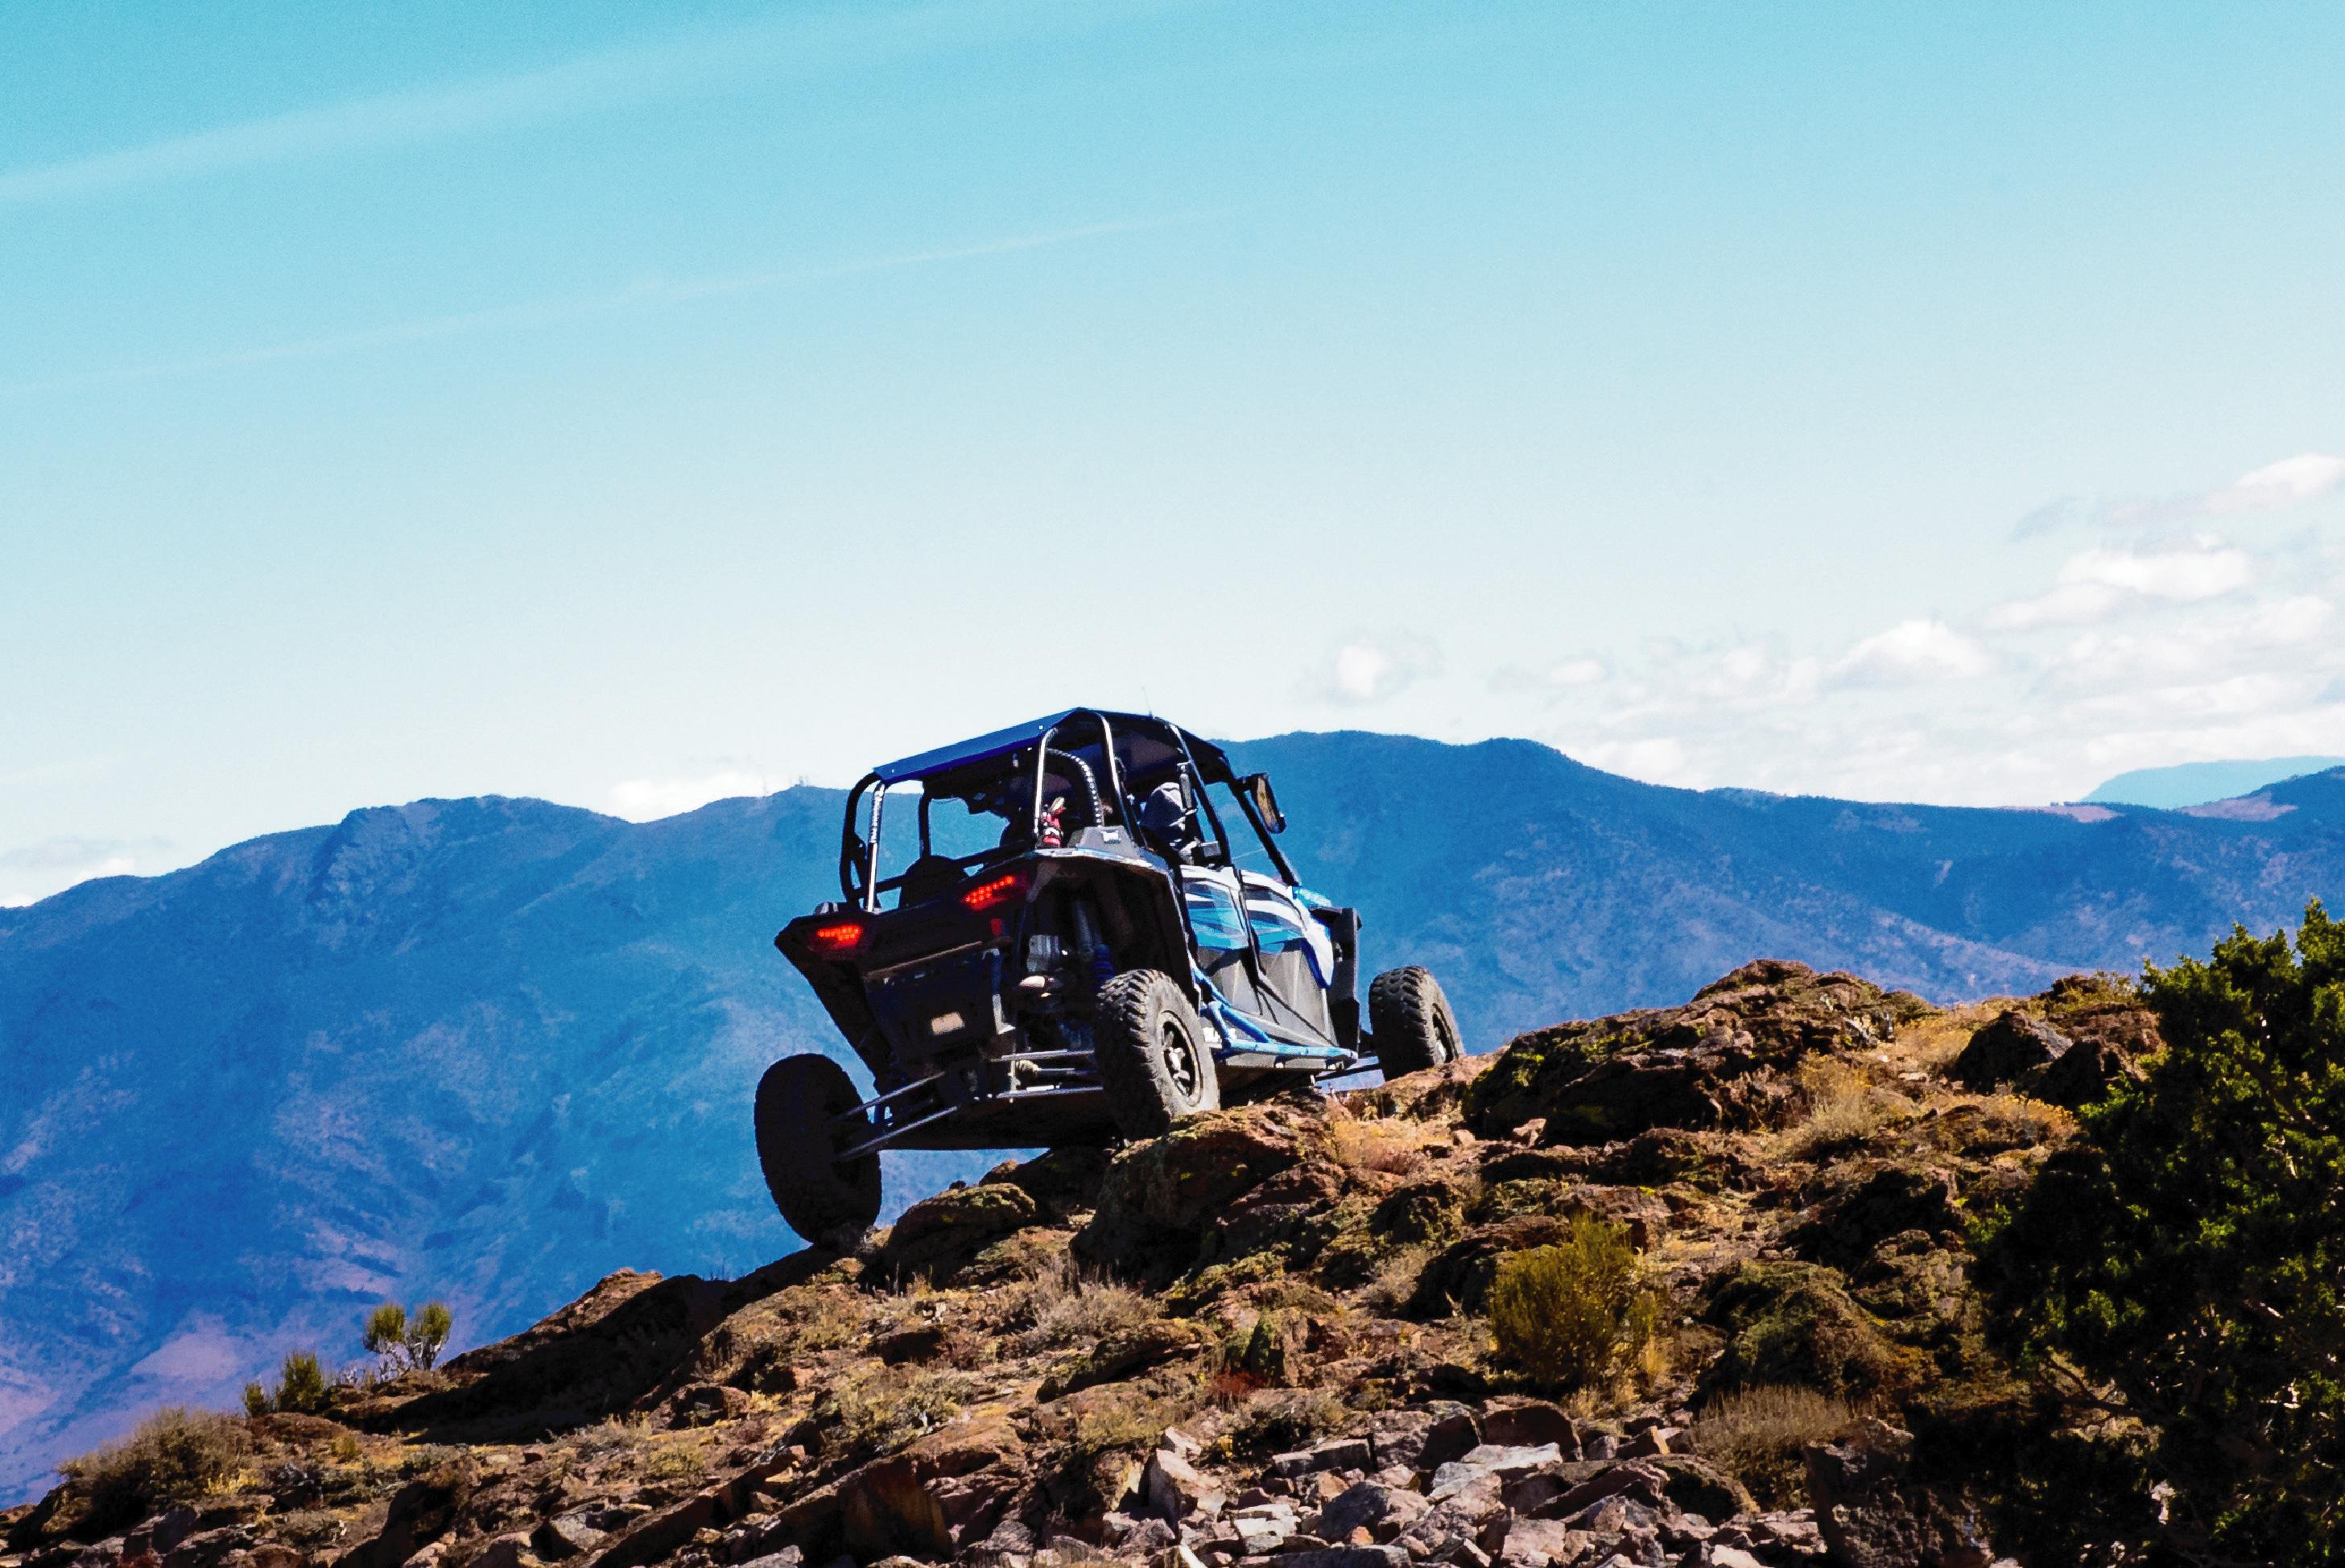 ATV trails in bozeman montana